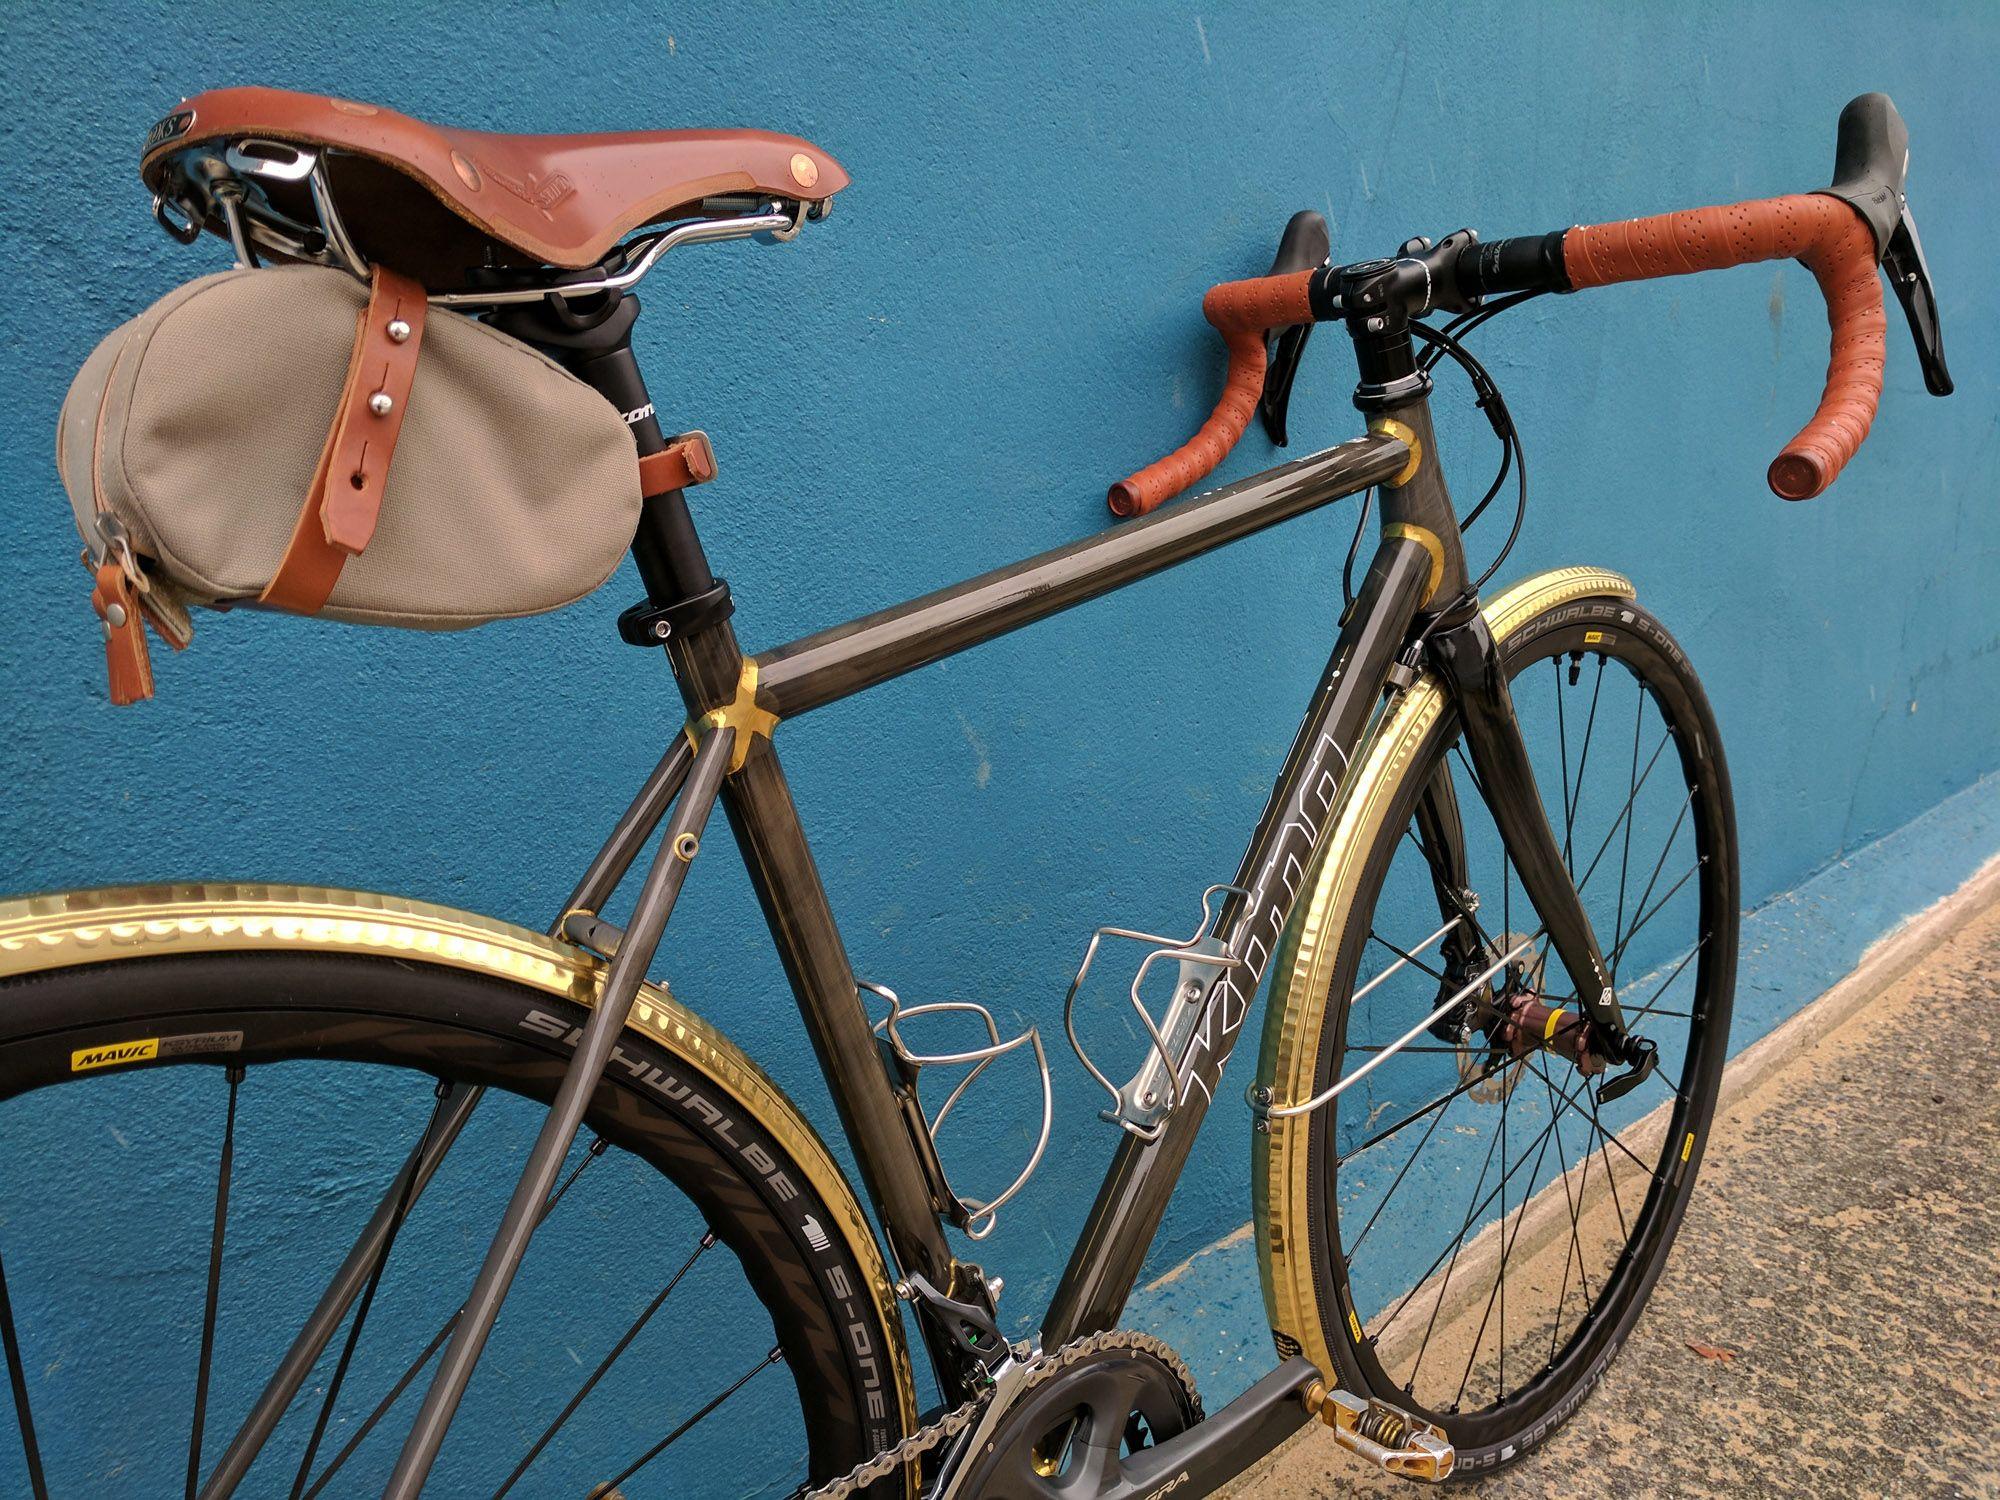 44b59ace6b7 Kona Dream Builds: A Very Sweet Roadhouse from Belmar Bike Shop ...